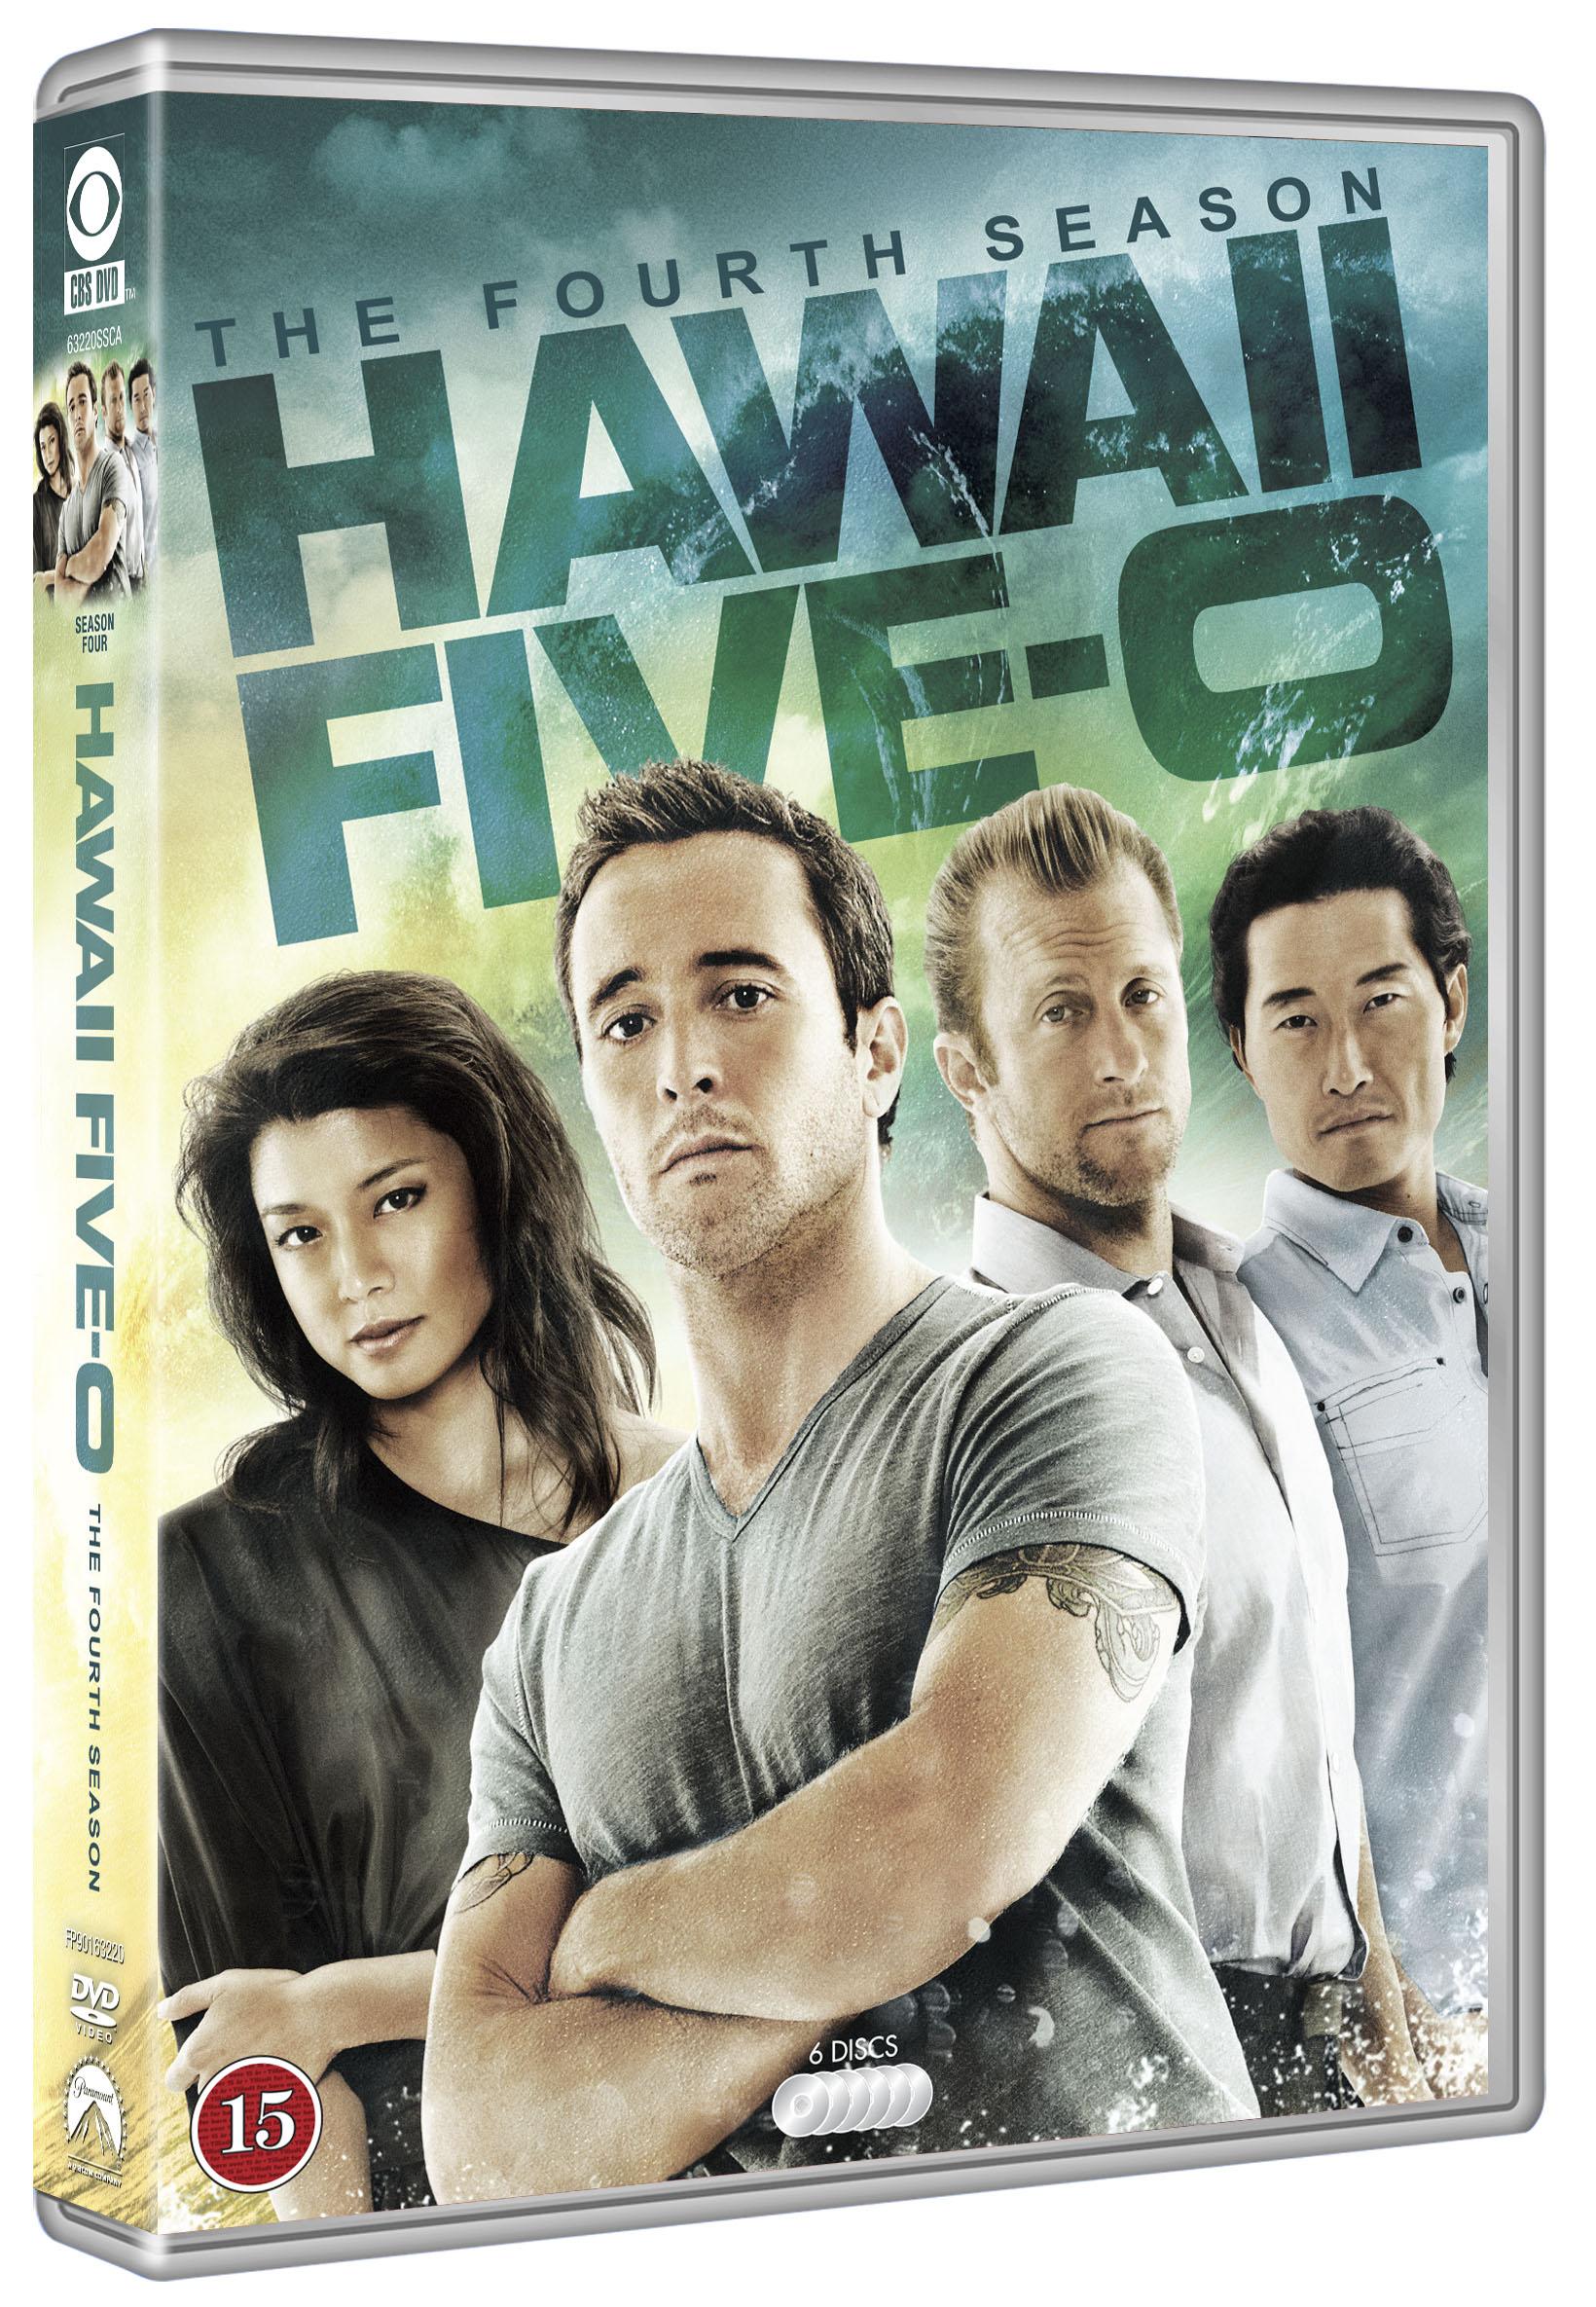 Hawaii Five-0 - Season 4 - DVD